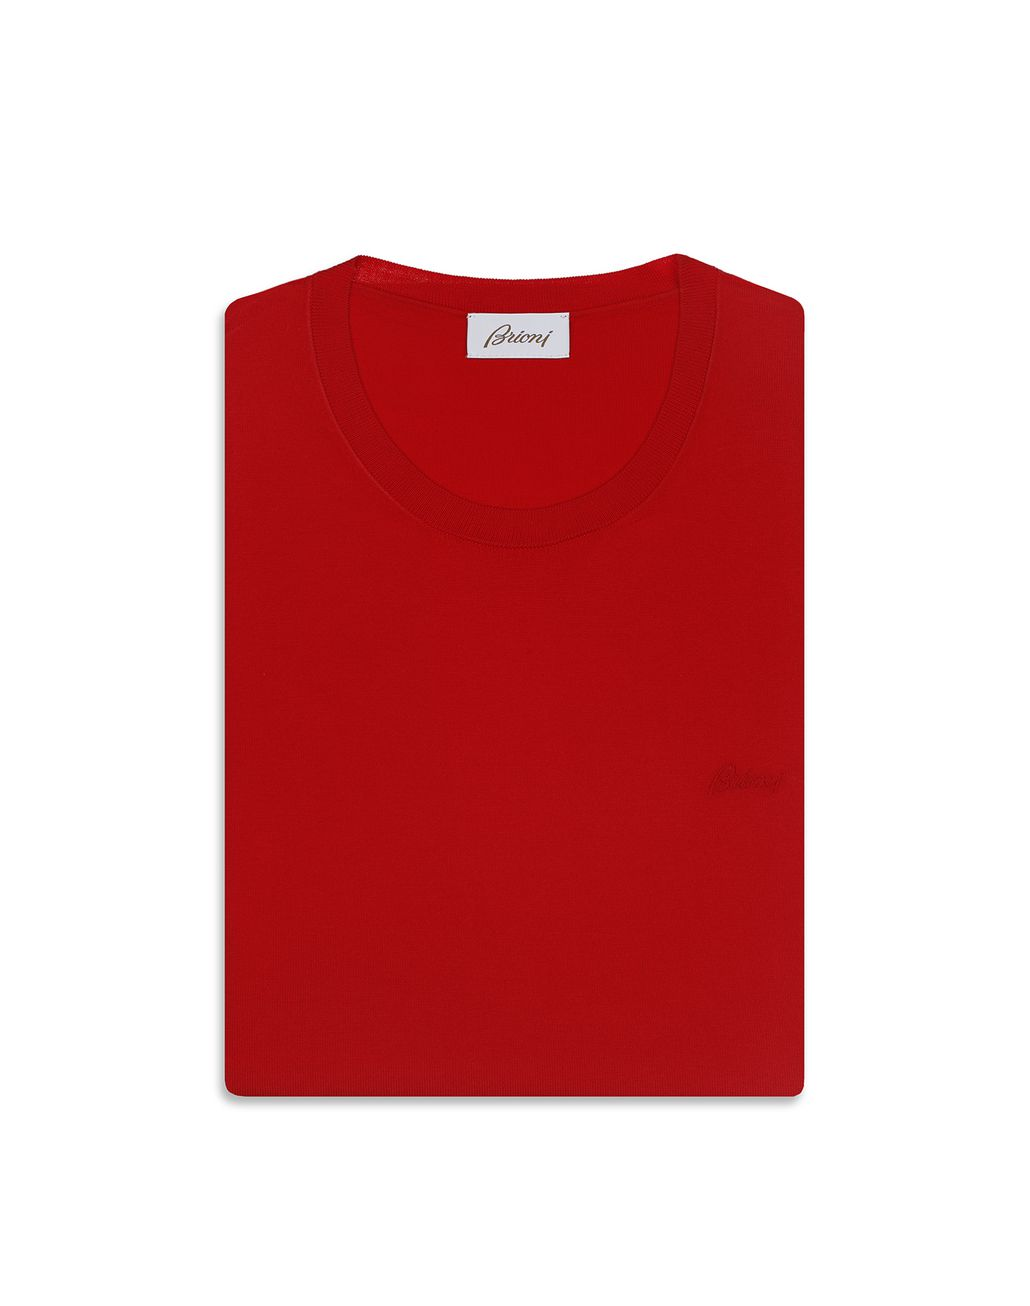 BRIONI Red Logoed T-Shirt T-Shirts & Polos Man e